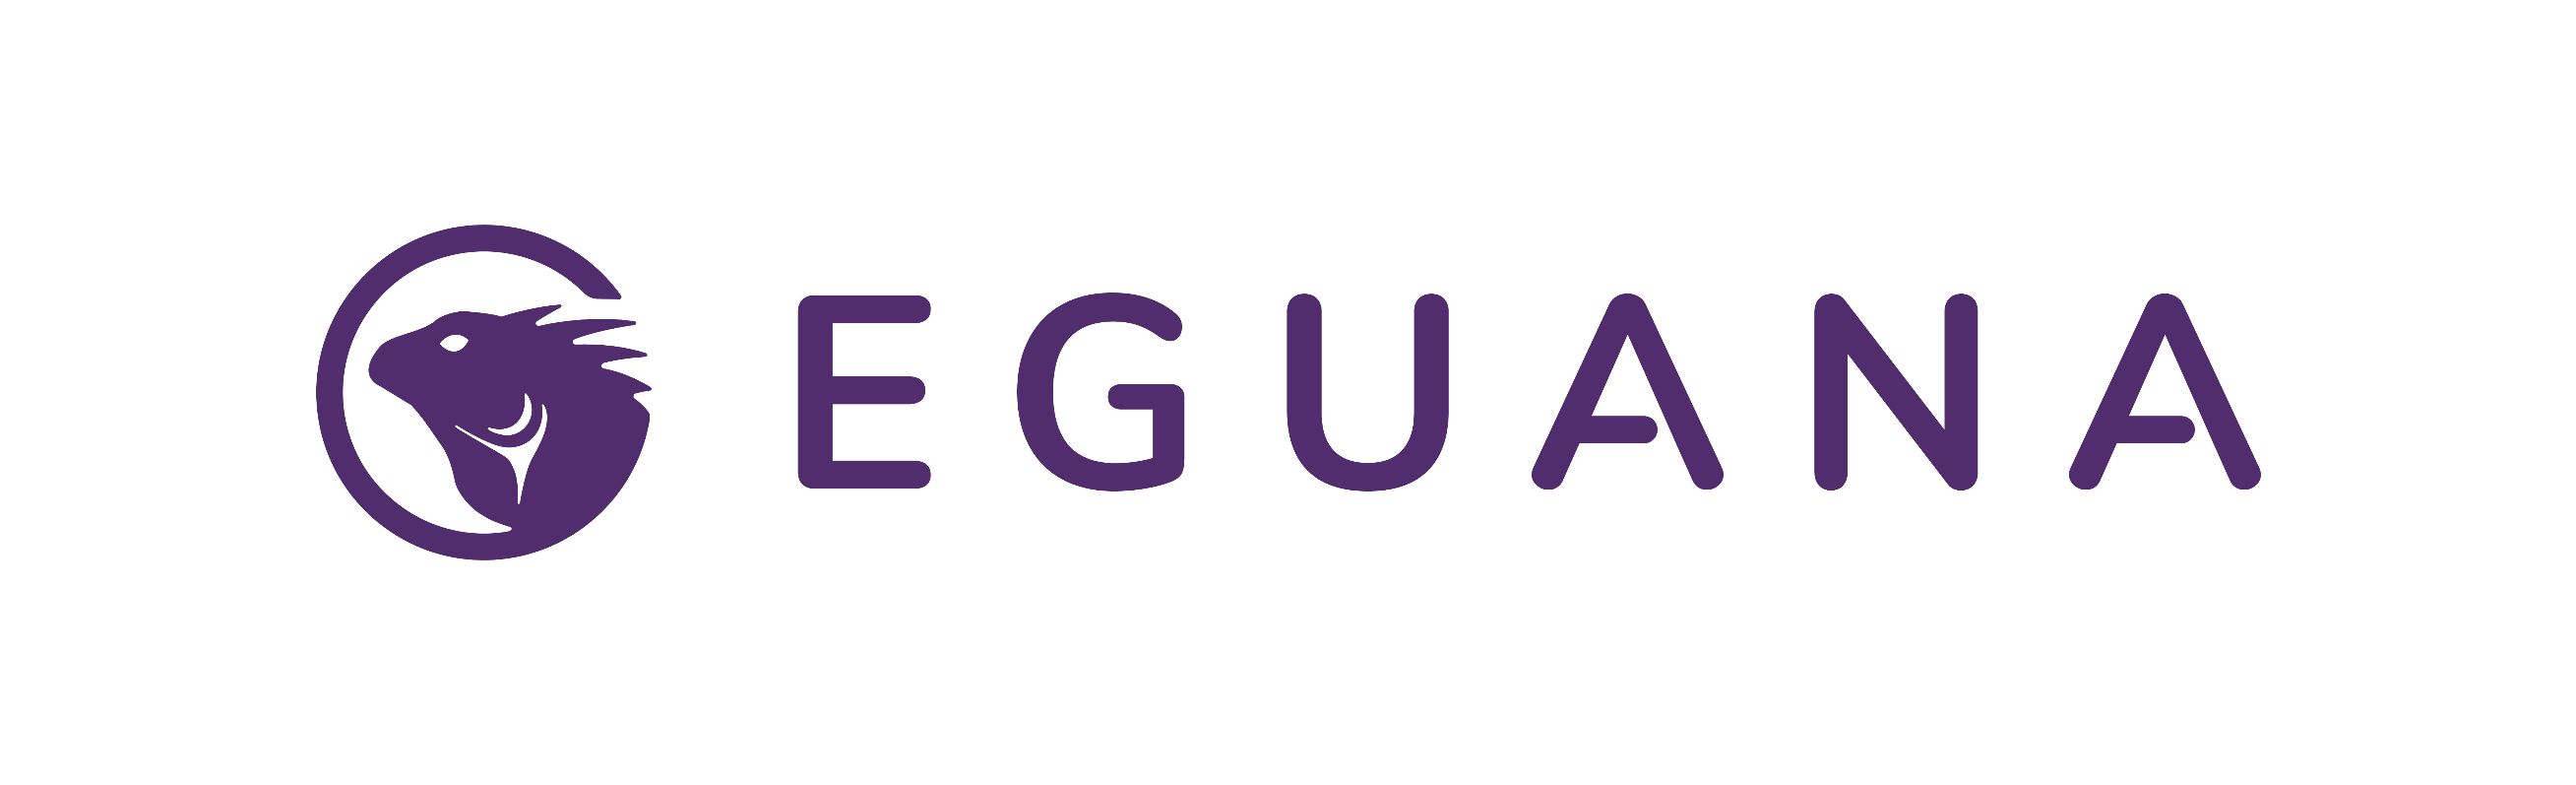 Eguana Announces Closing of $1